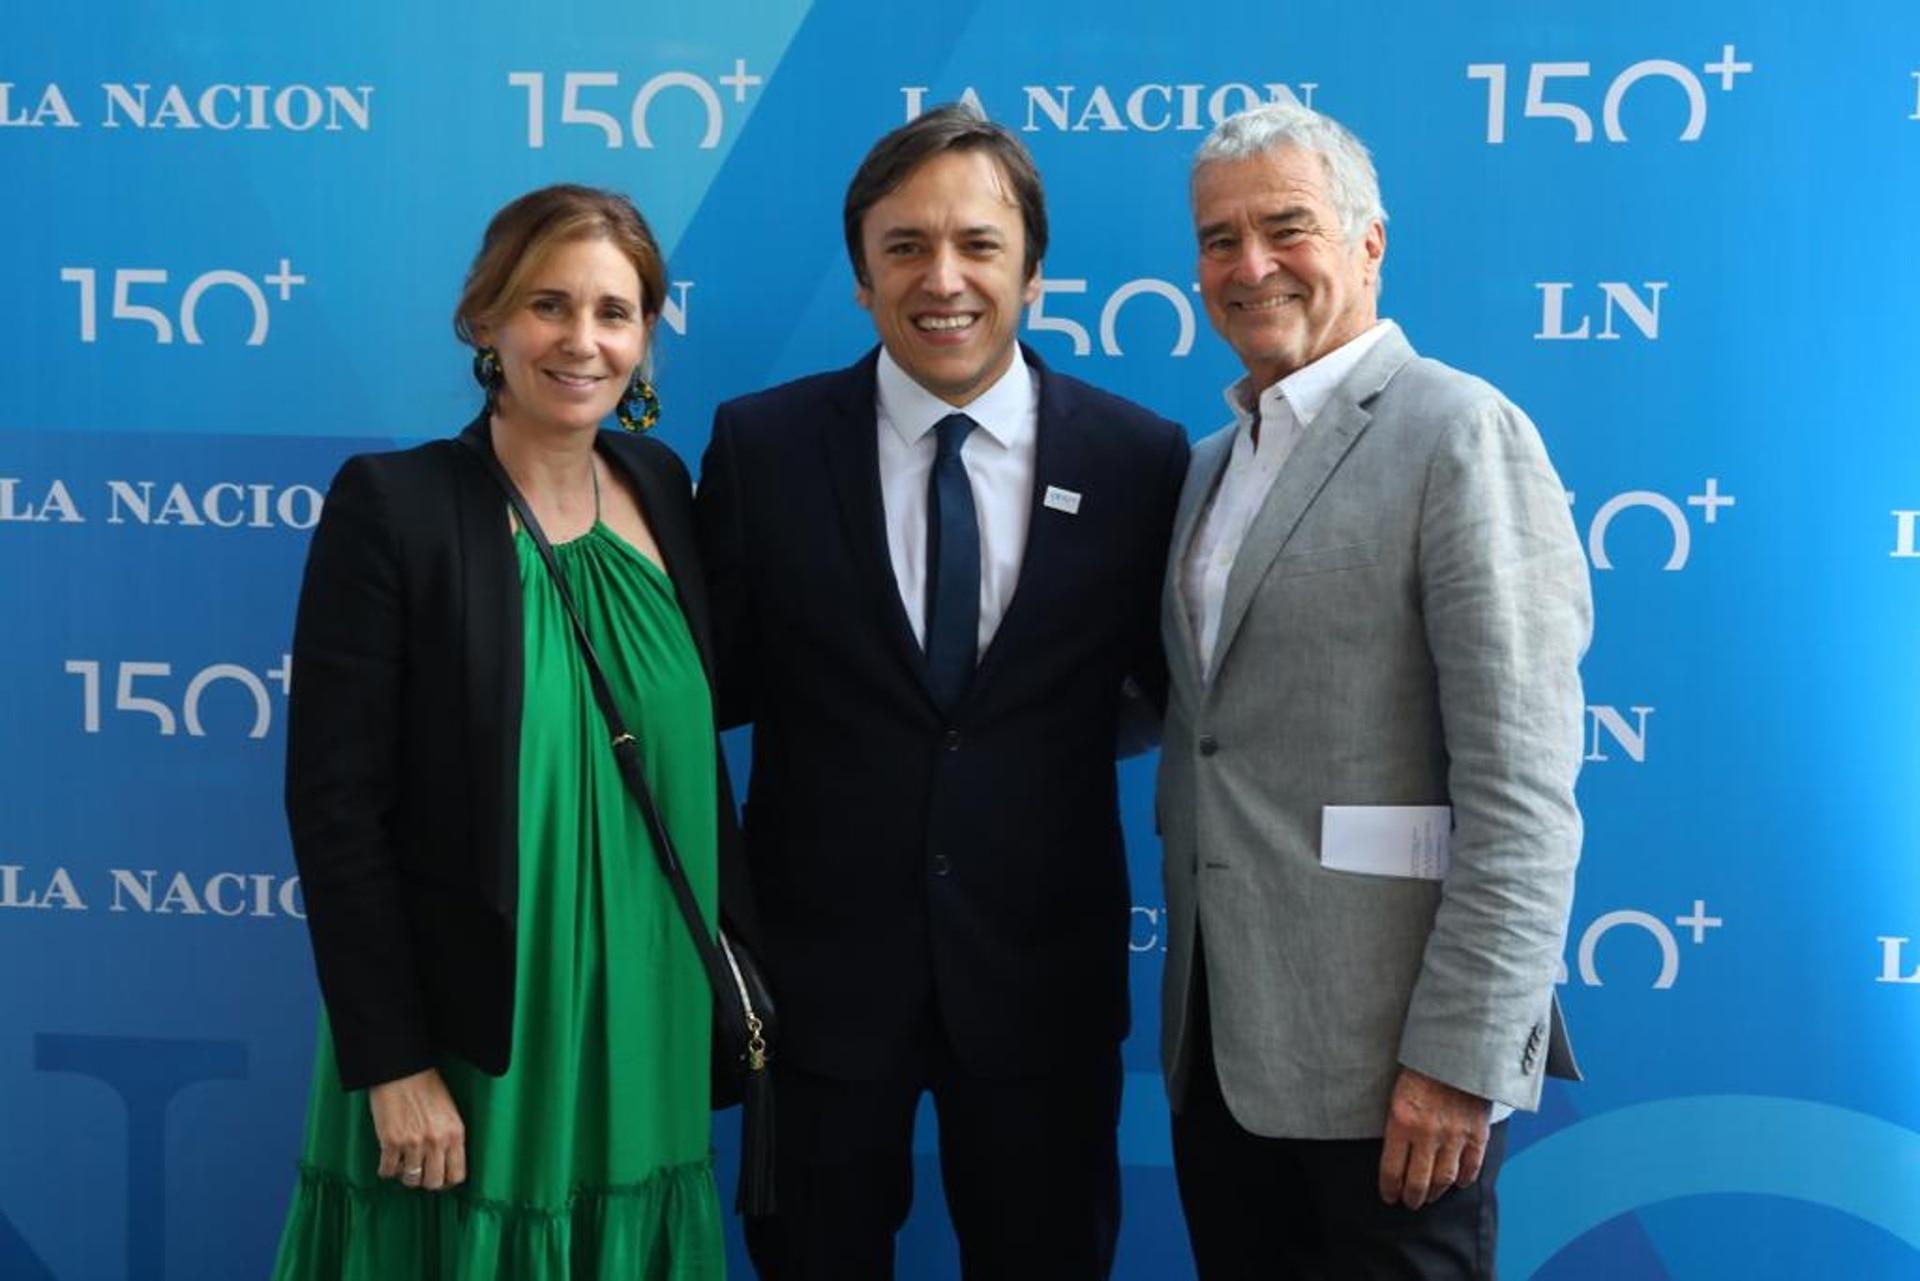 Cecilia González Villanueva, Jose del Rio e Ignacio Viale